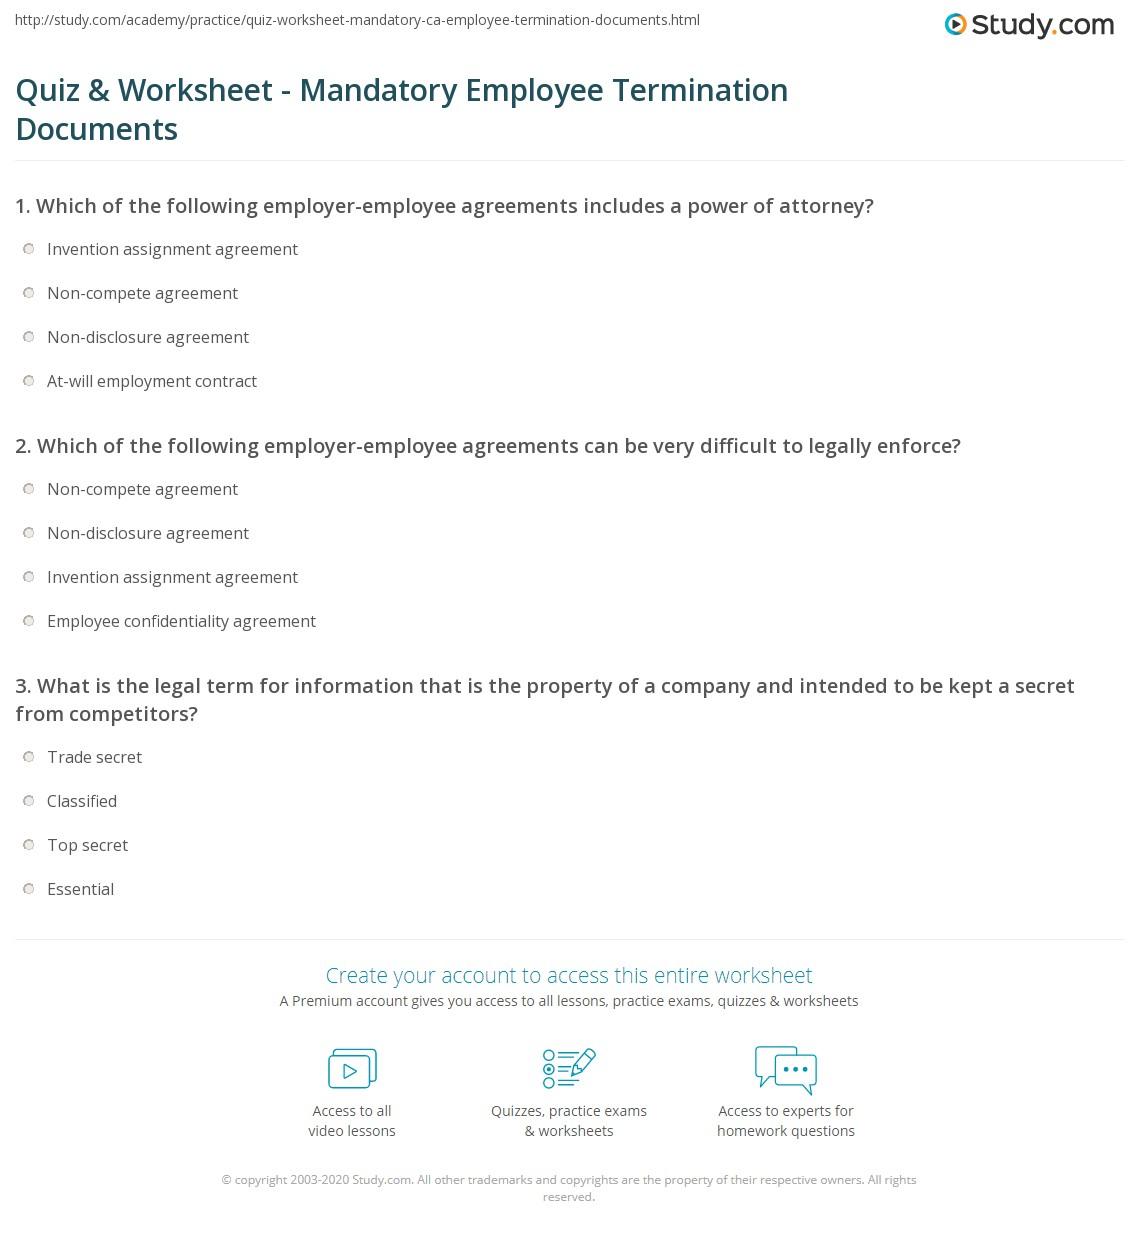 Quiz Worksheet Mandatory Employee Termination Documents Study